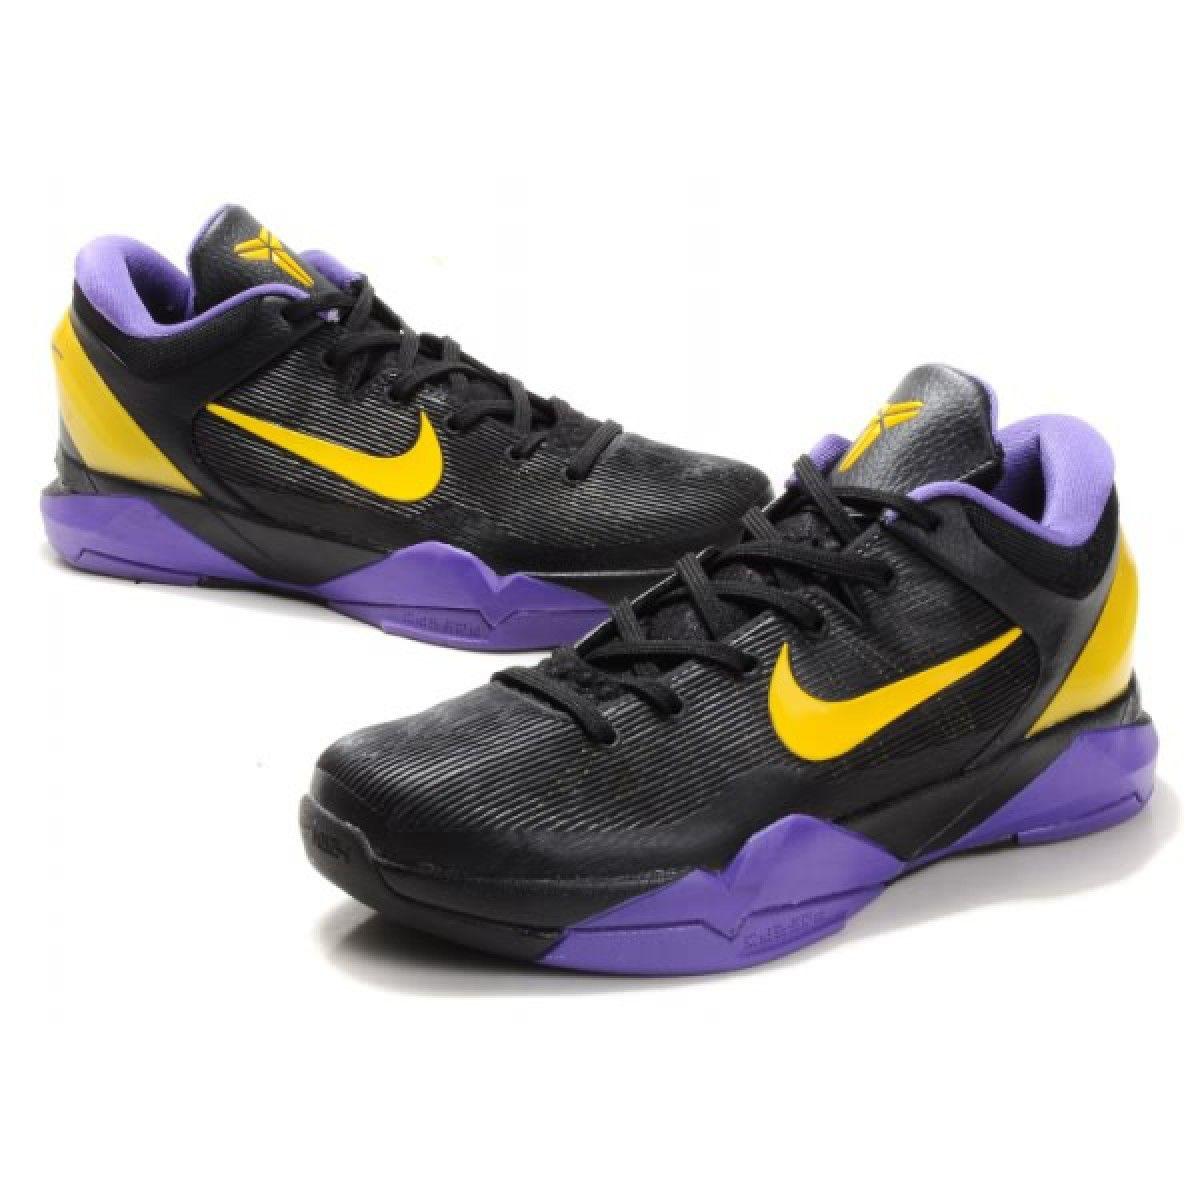 Nike Zoom Kobe VII Basketball Shoes Kobe Bryant Shoes Black Purple Gold .